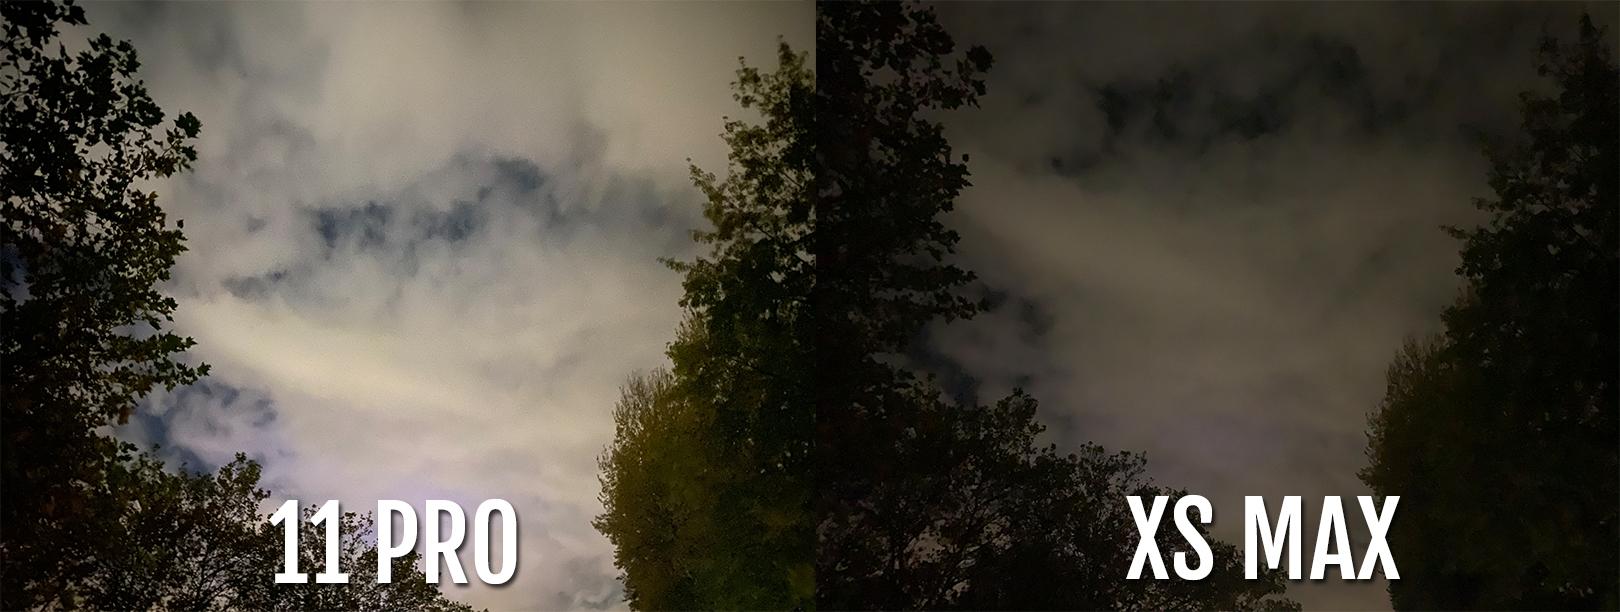 iphone-11-pro-kamera-vergleich-8